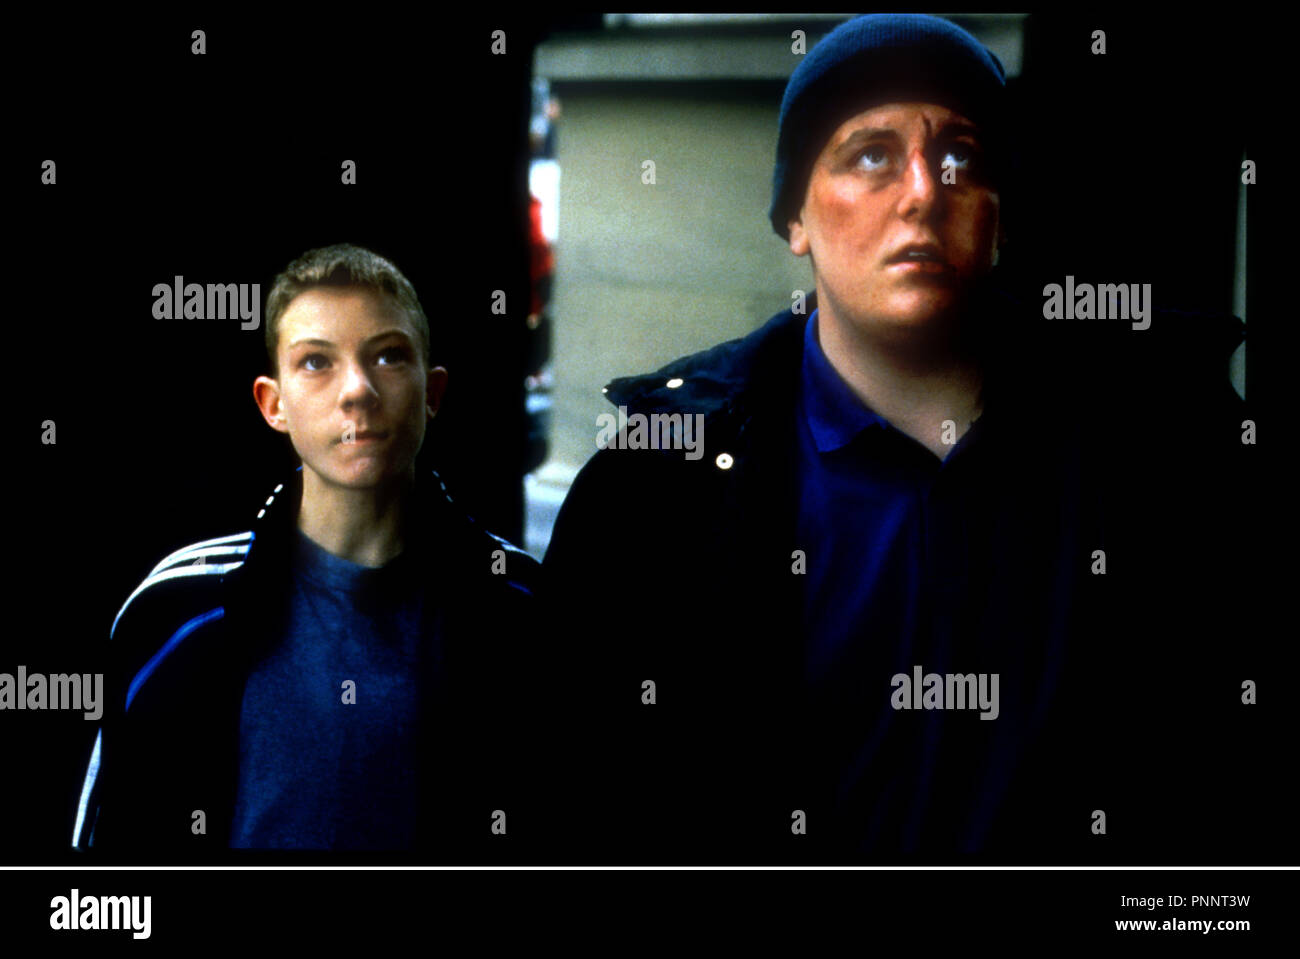 Thameslink Season Ticket >> Season Ticket Stock Photos & Season Ticket Stock Images - Alamy